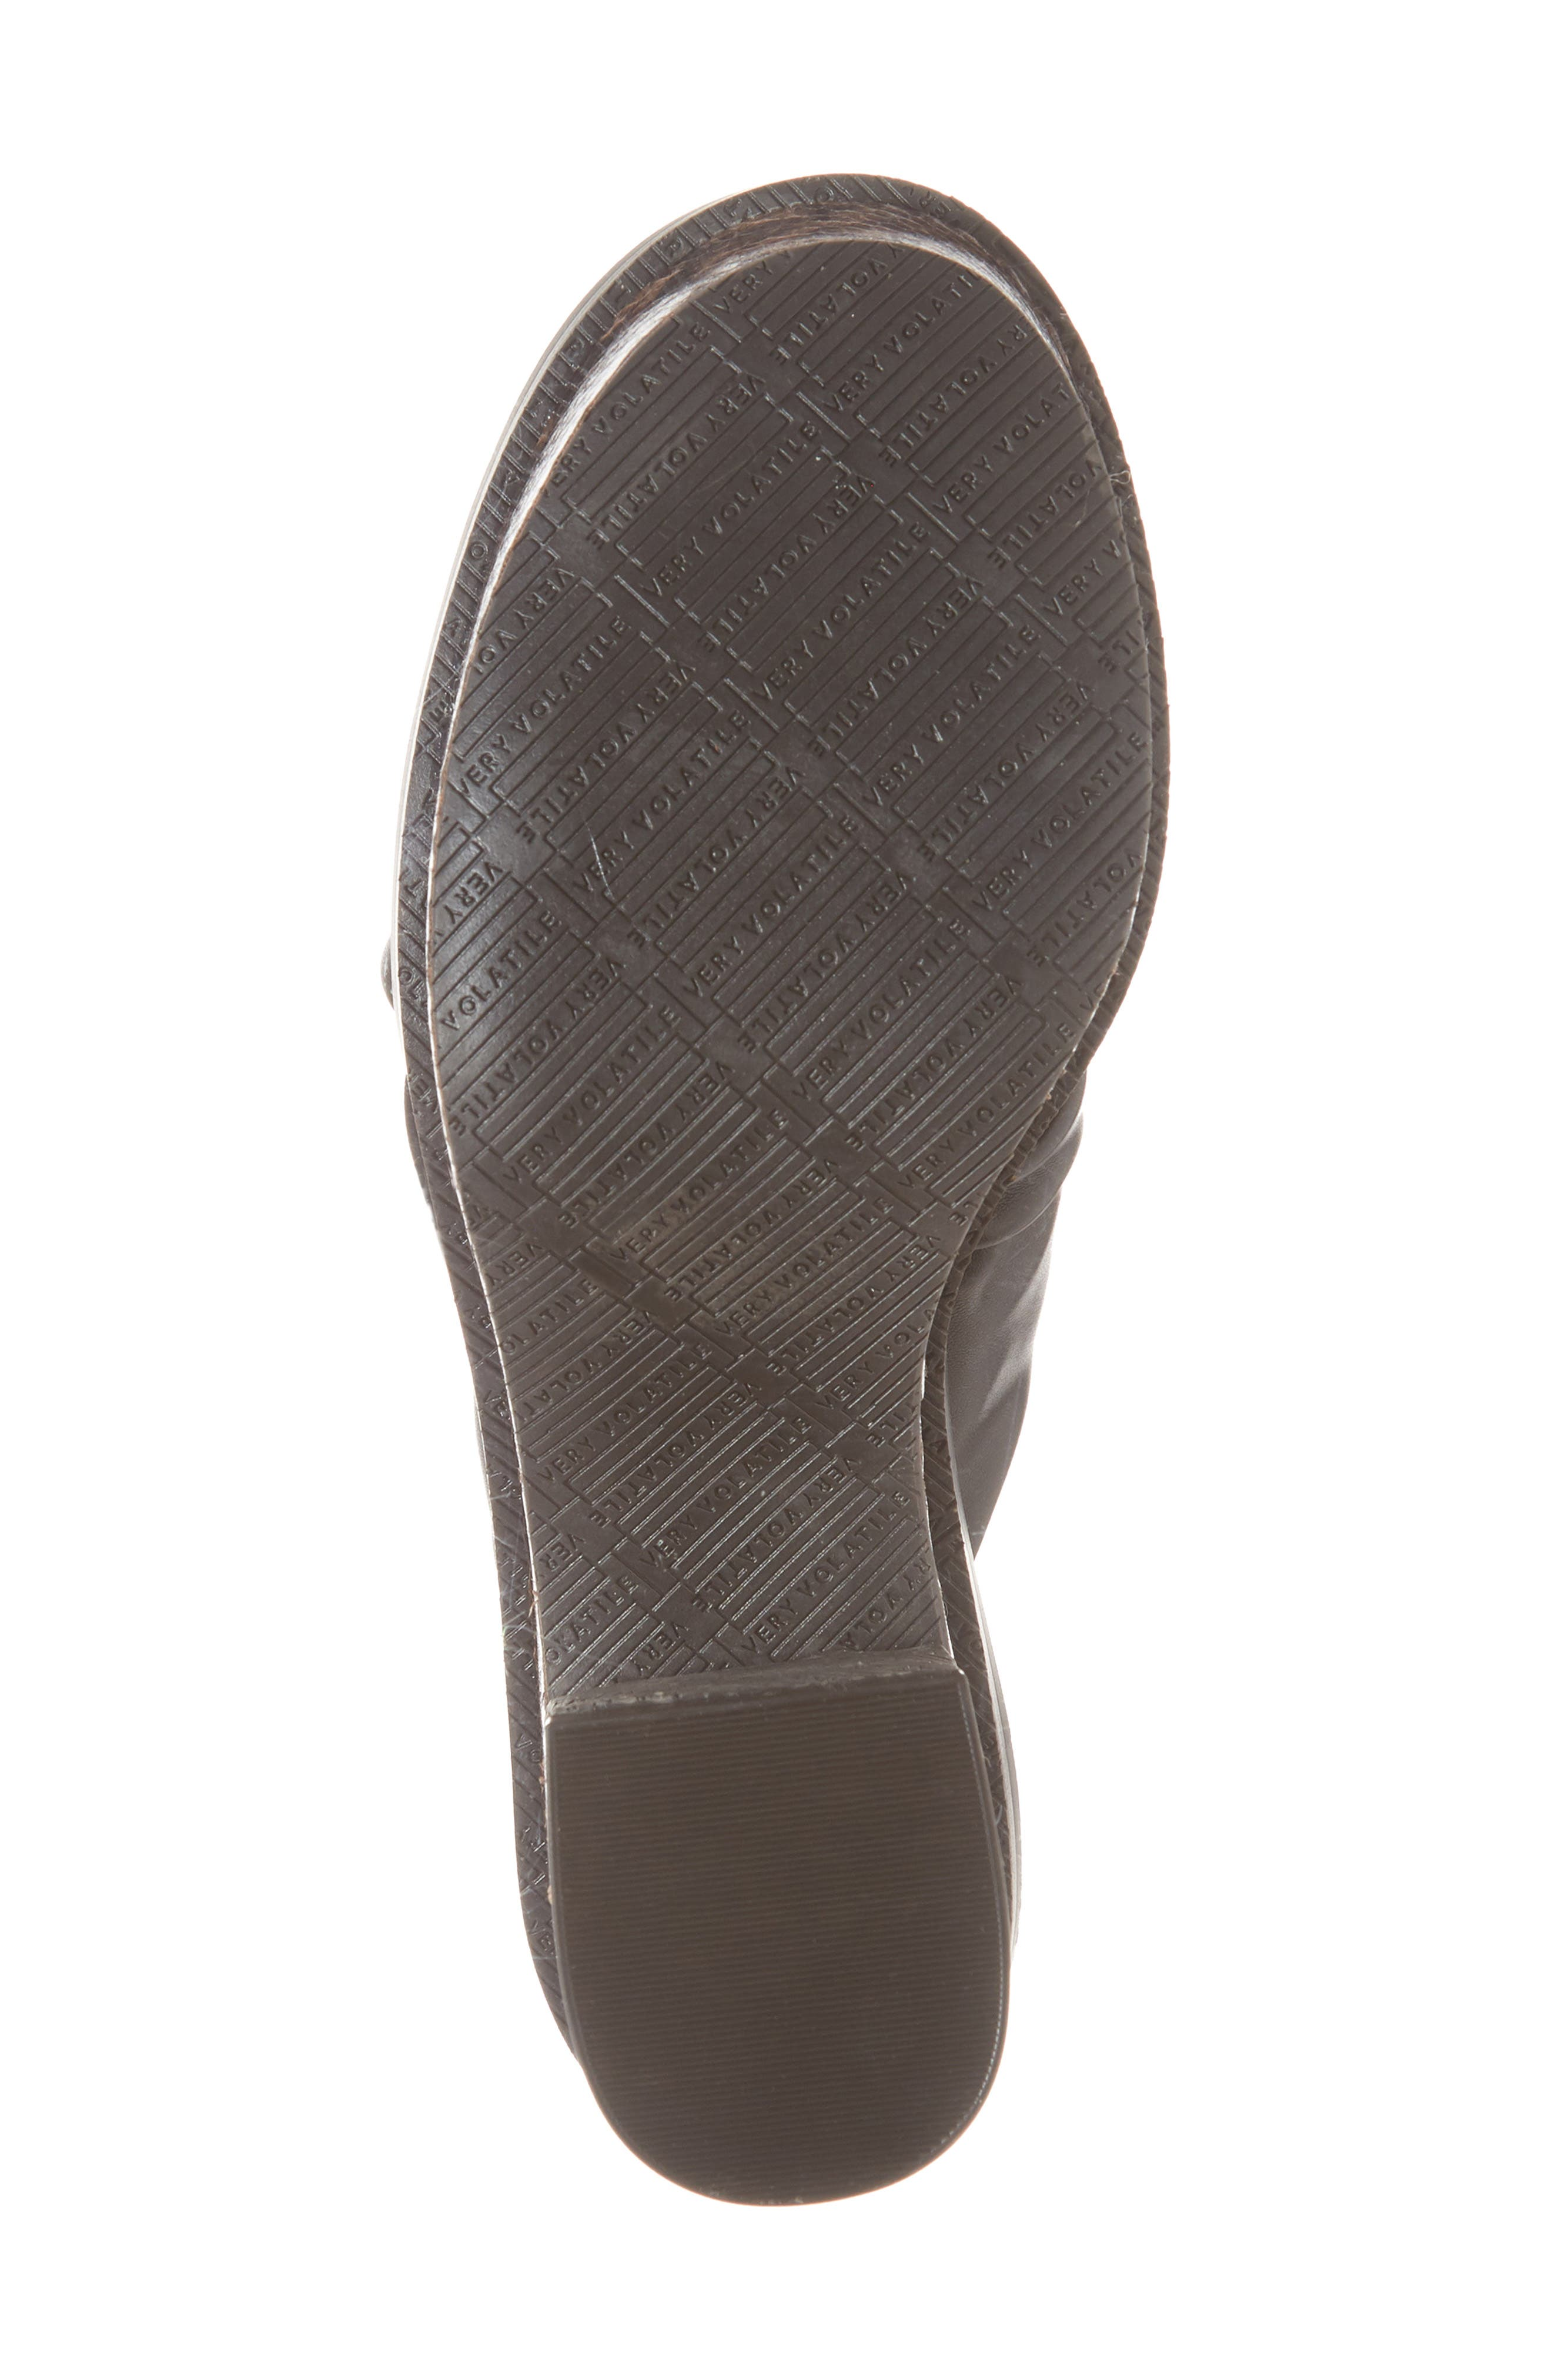 Ainsley Platform Sandal,                             Alternate thumbnail 6, color,                             Black